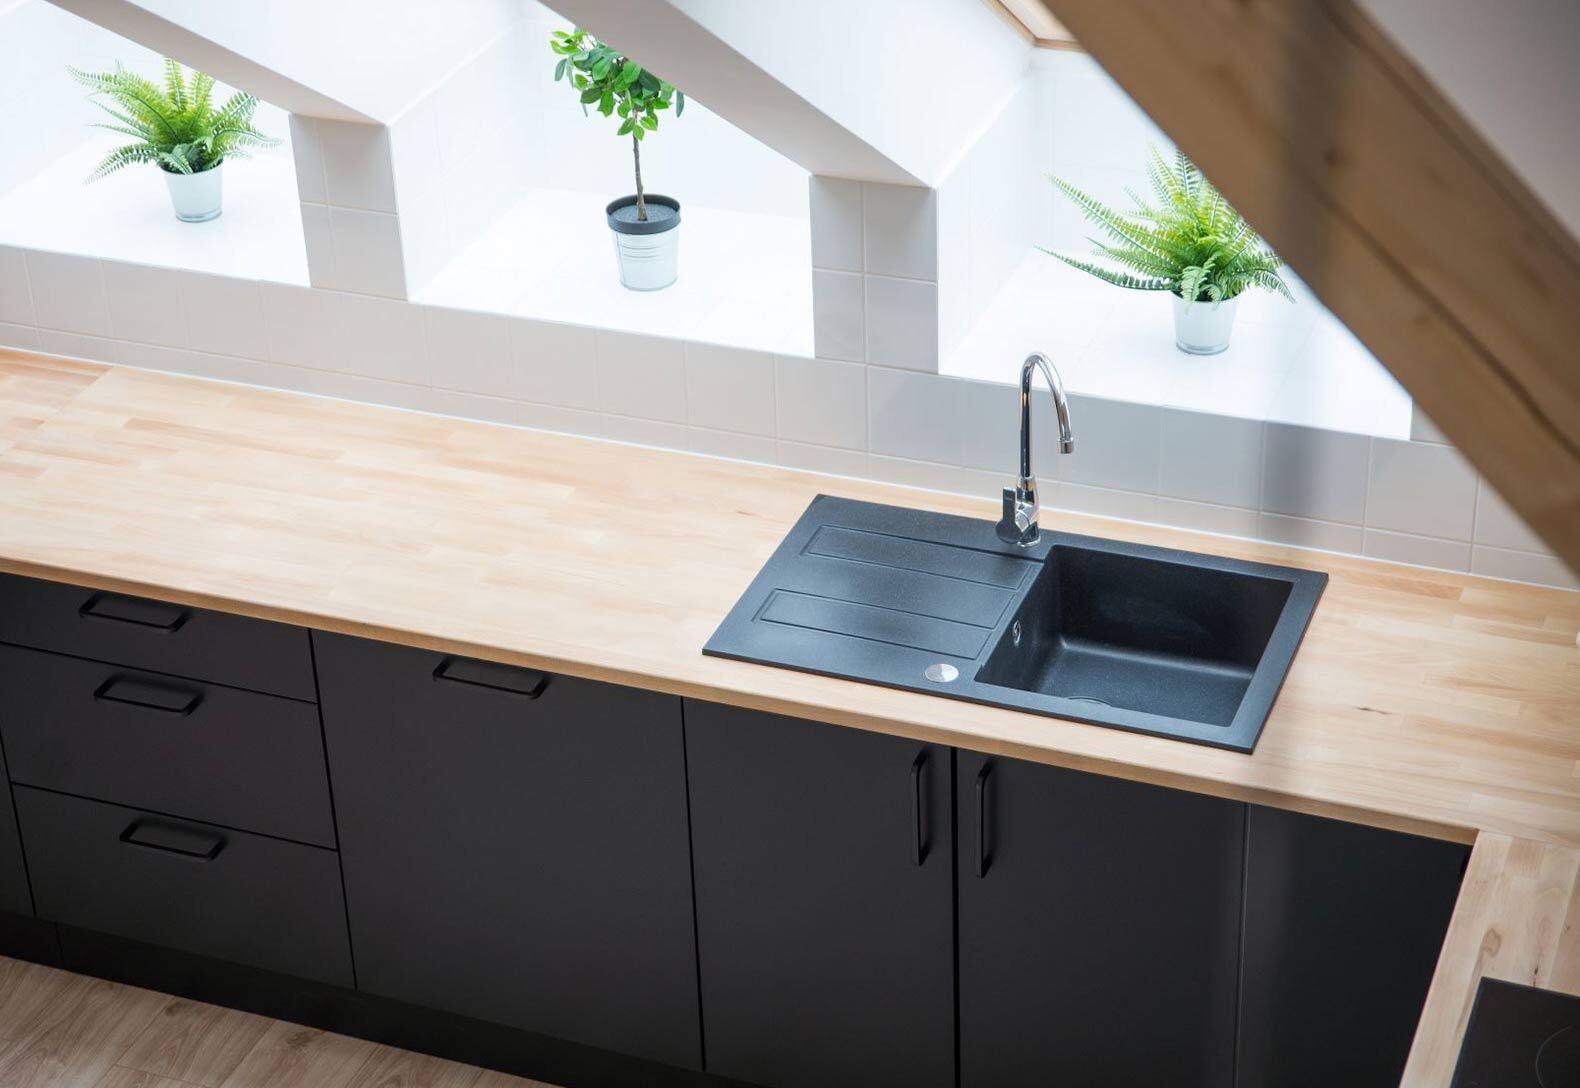 lavello cucina con o senza gocciolatoio Lecce